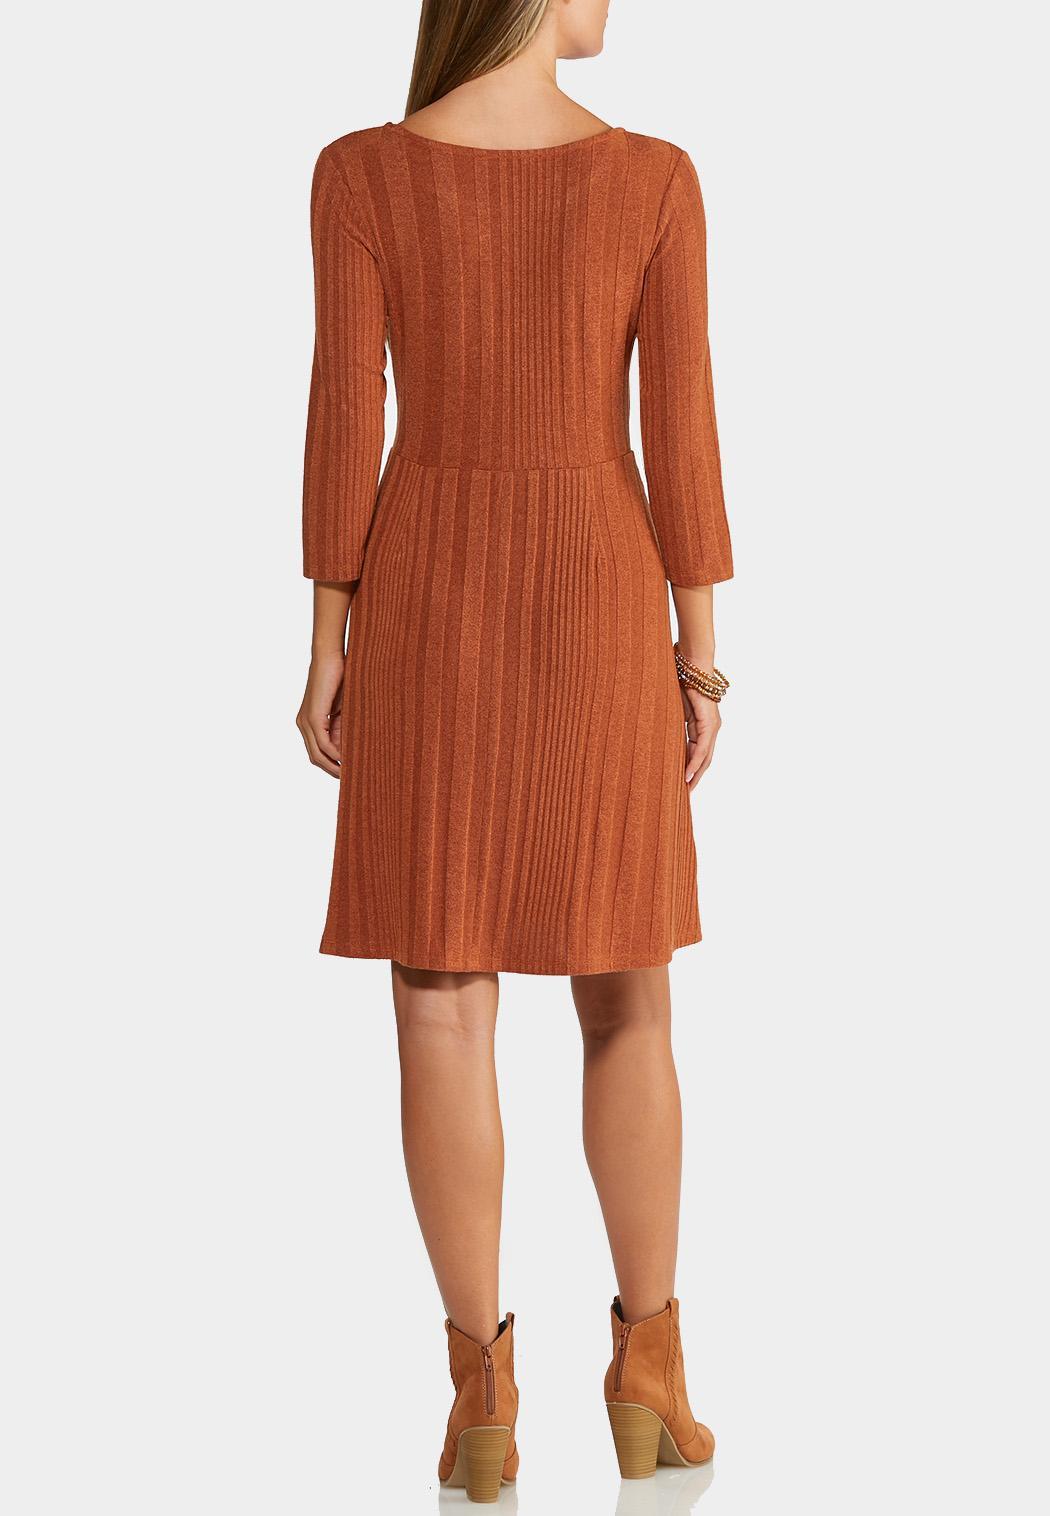 Plus Size Ribbed Twist Dress (Item #43989661)